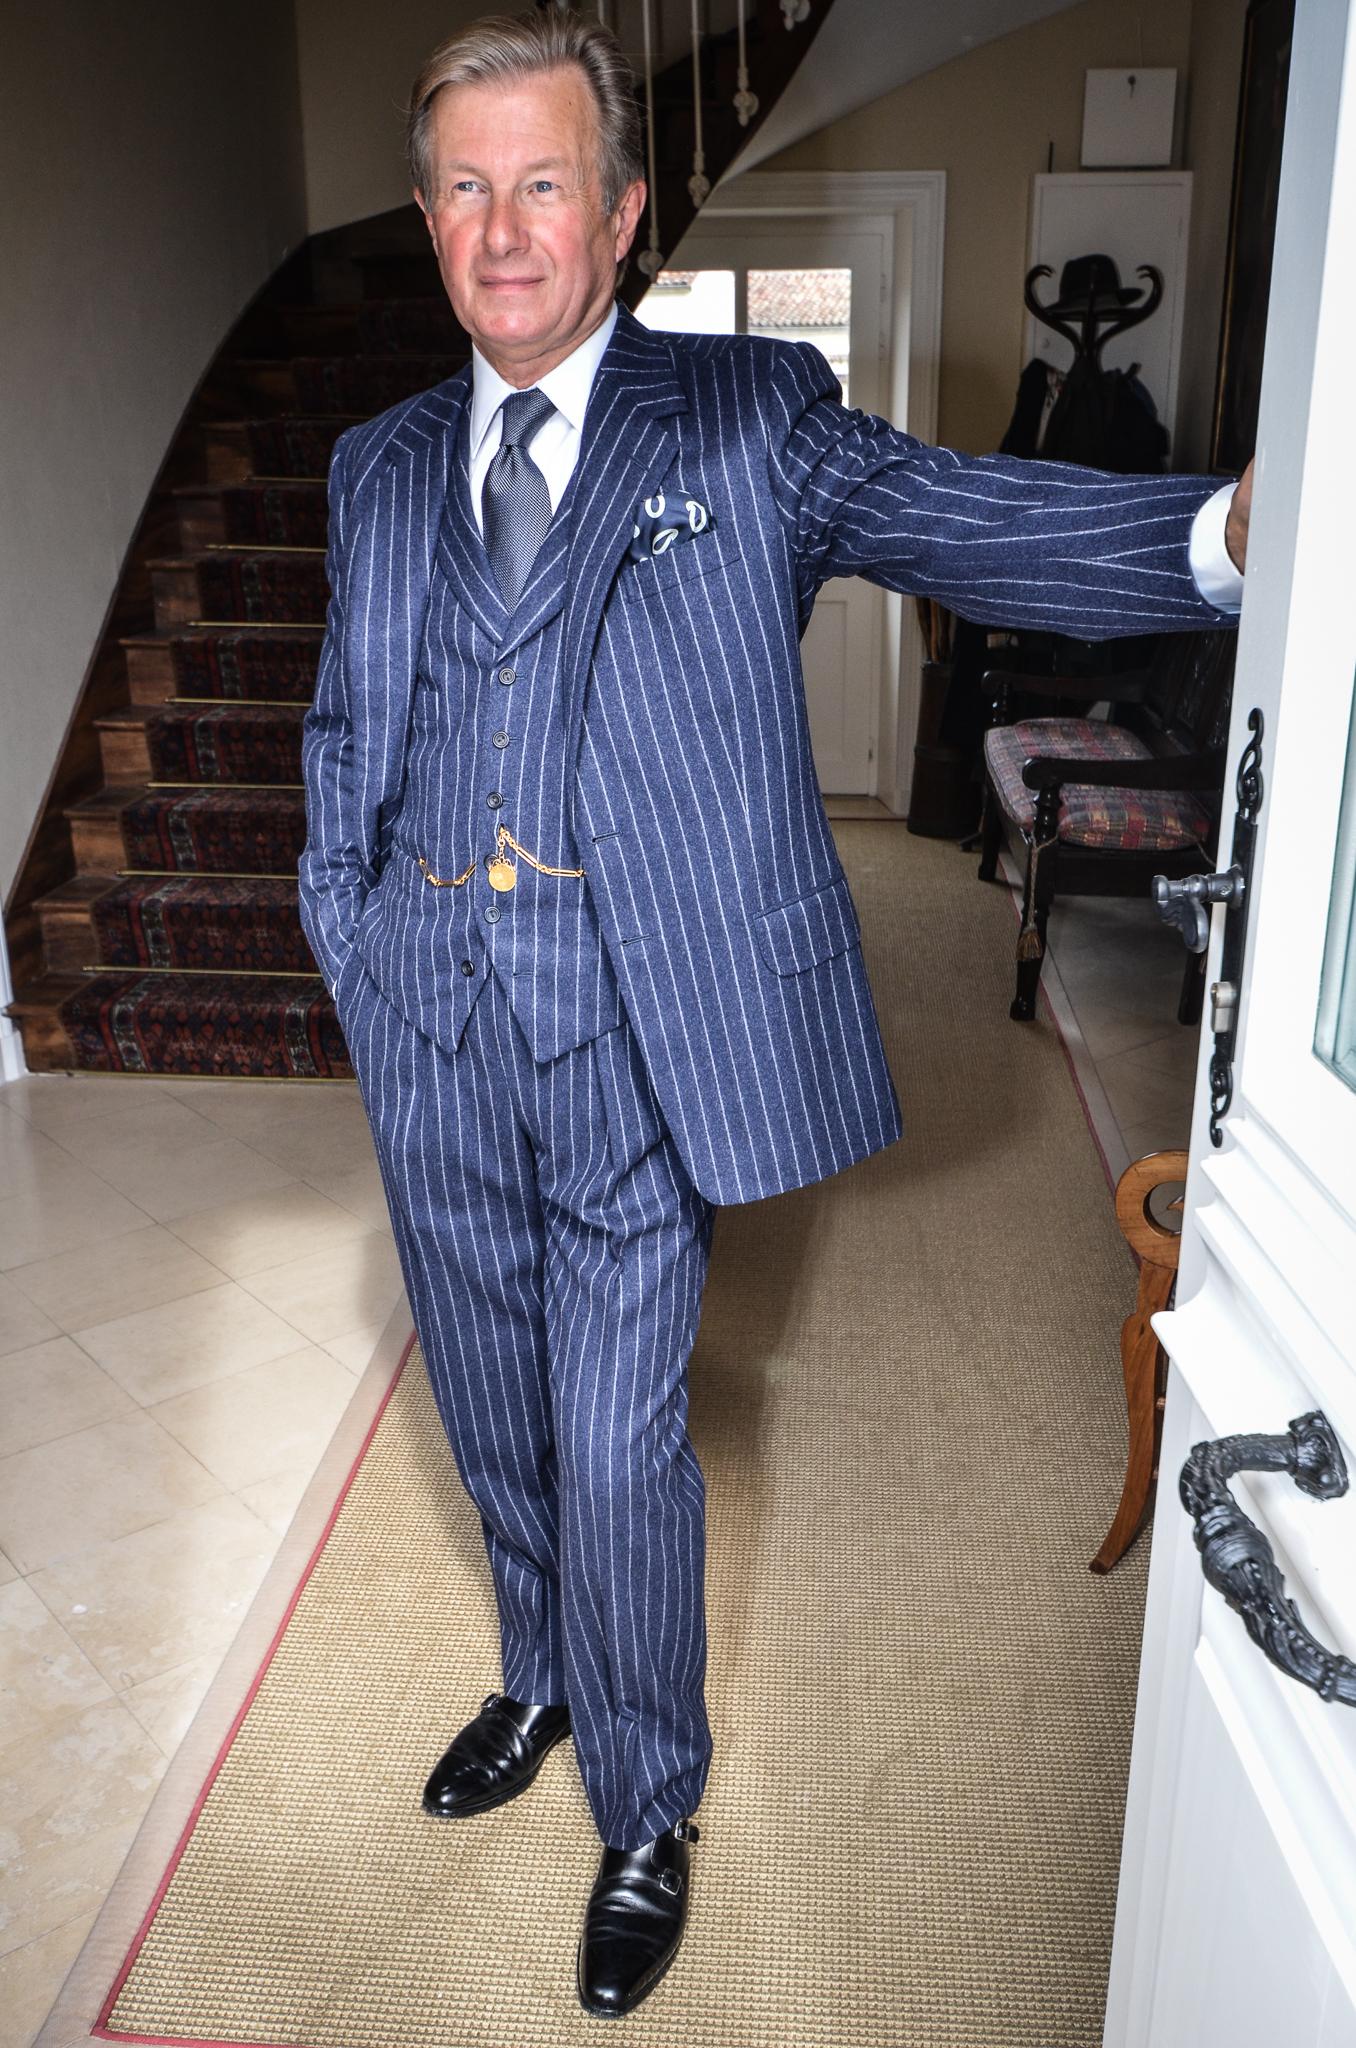 Garments-25-3-Piece-Blue-Chalk-Stripe-Suit-0553.jpg